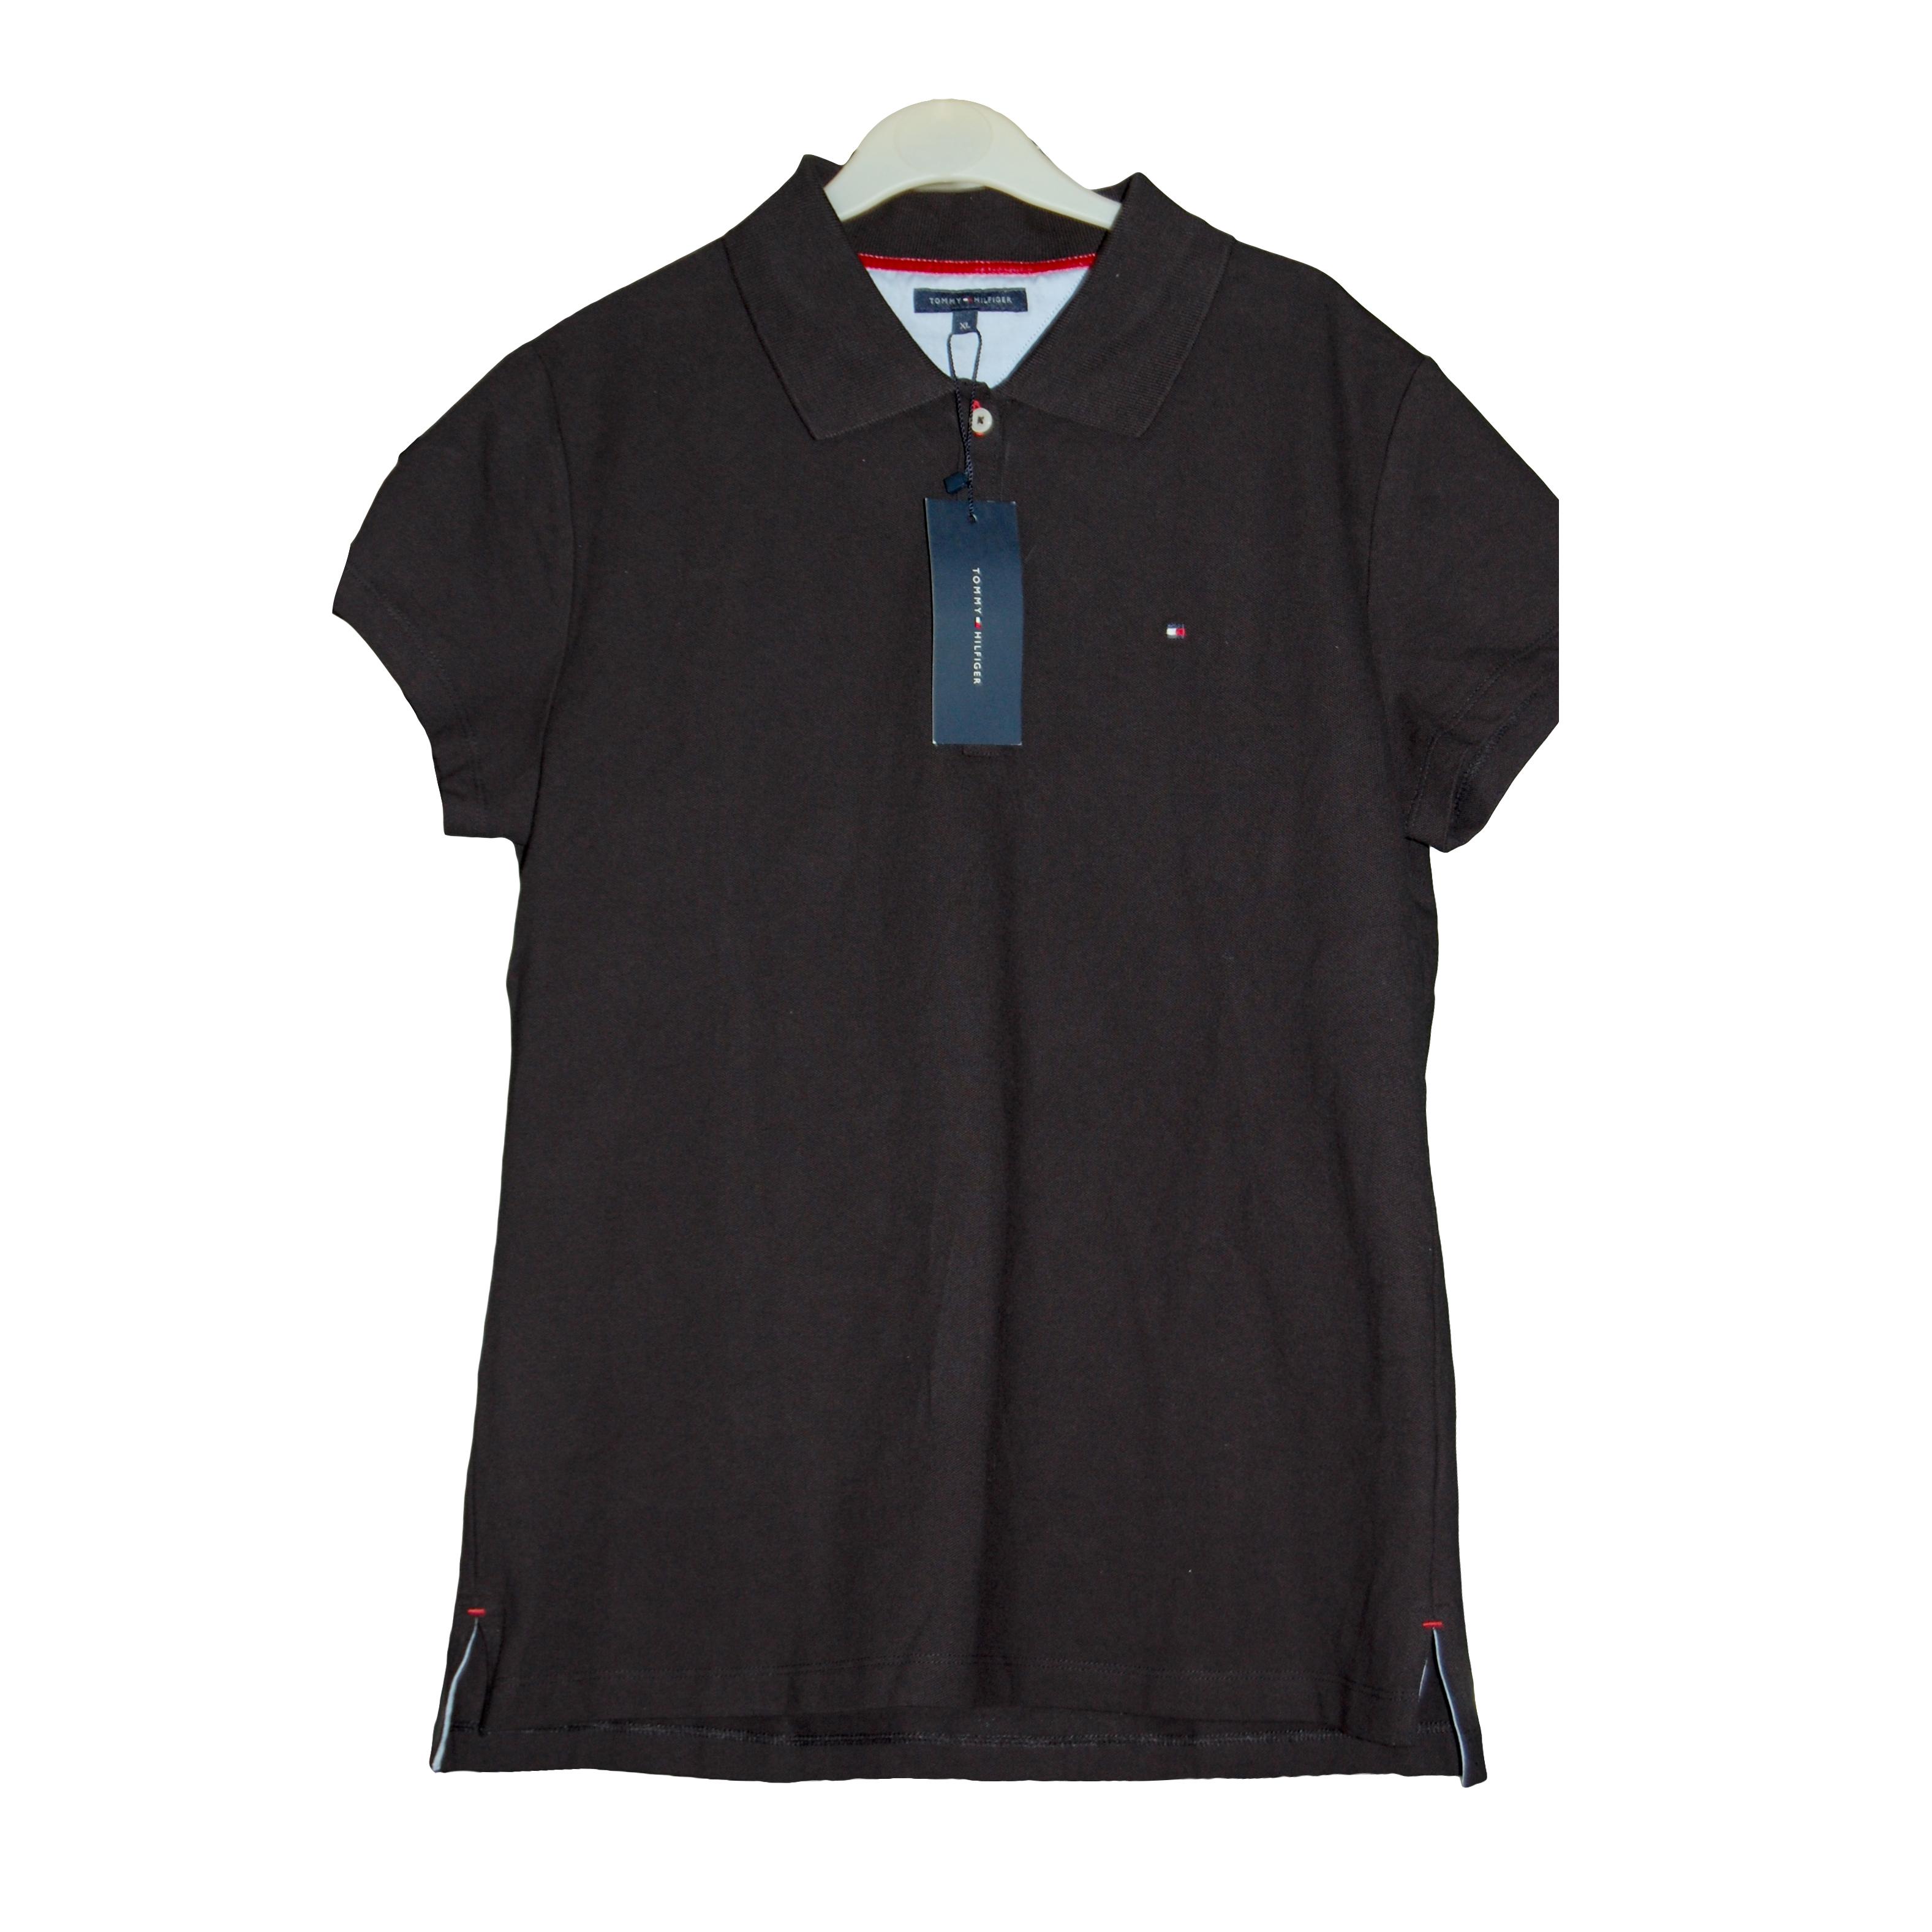 Tommy Hilfiger Polo Shirt Boys Black